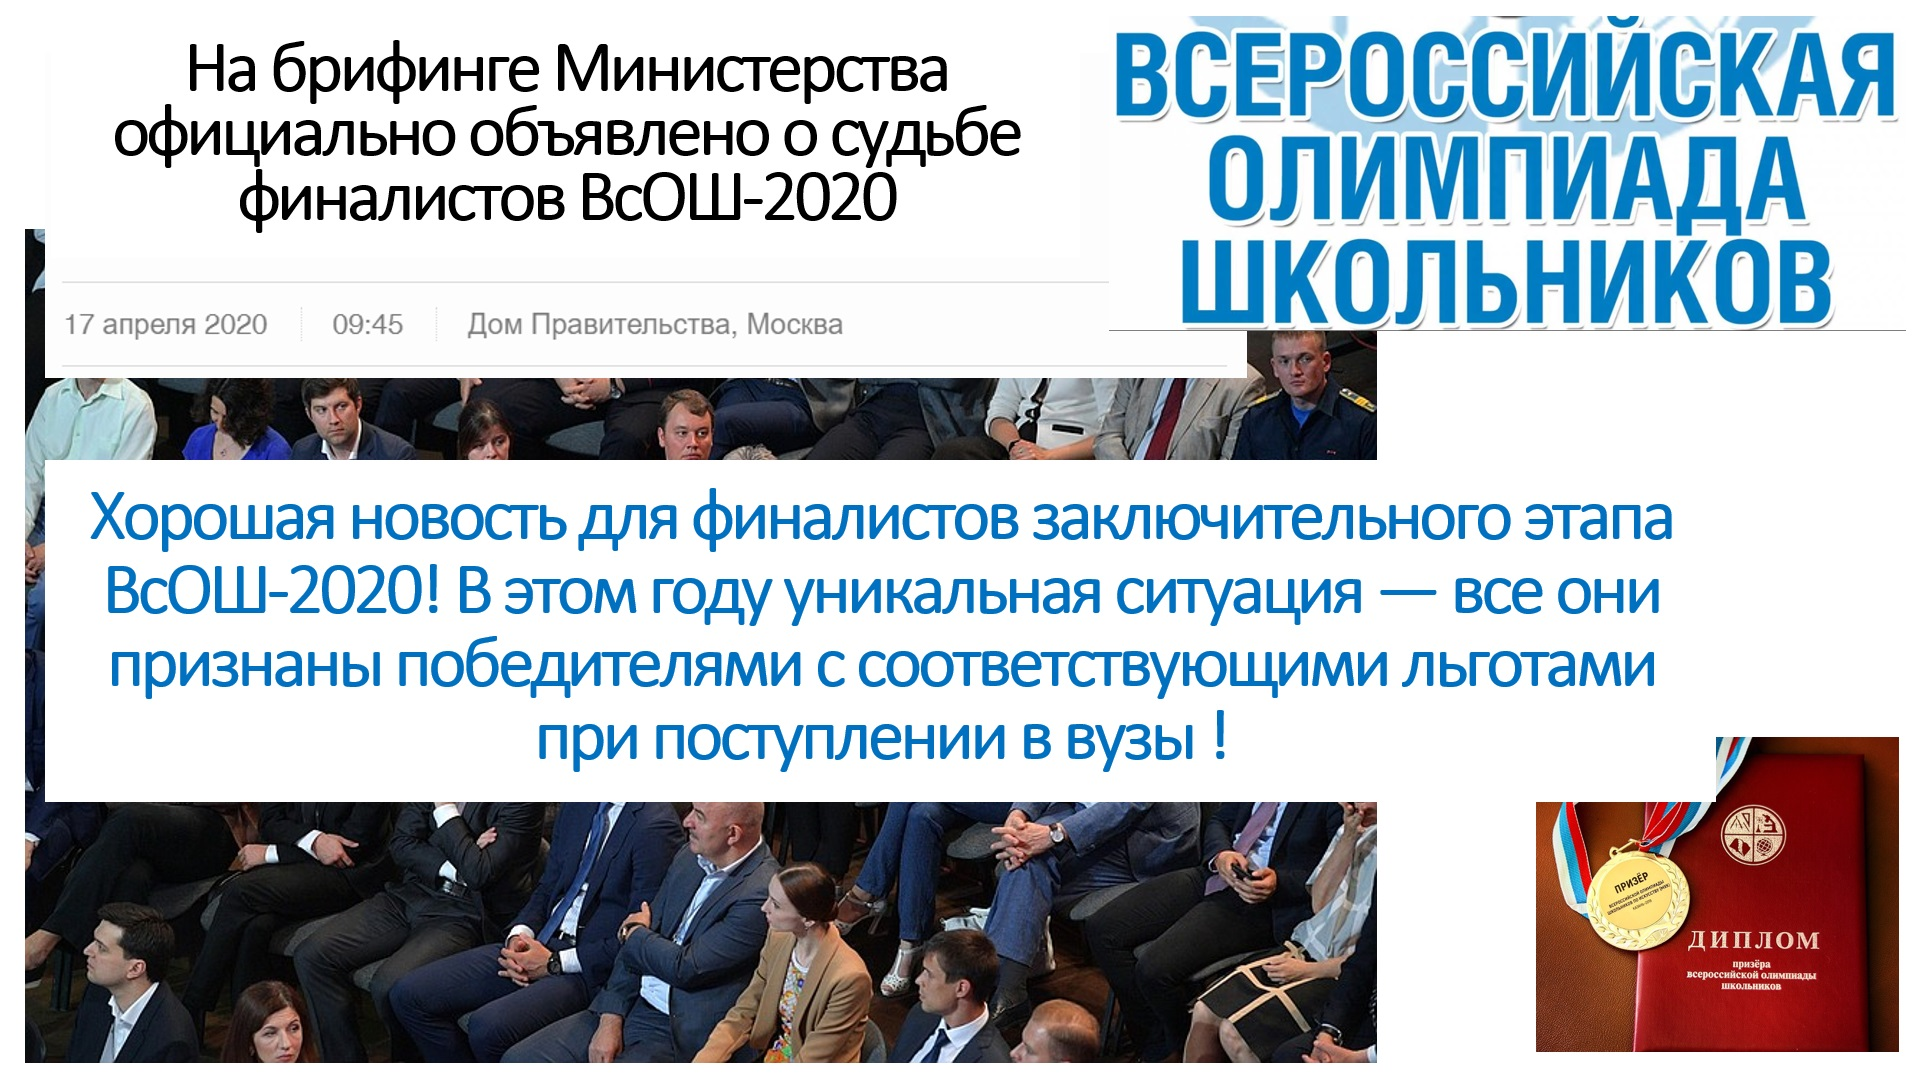 "<b class=""_""></b>Брифинг министра просвещения РФ Сергея Кравцова в Доме правительства 17 апреля 2020 года<br>"